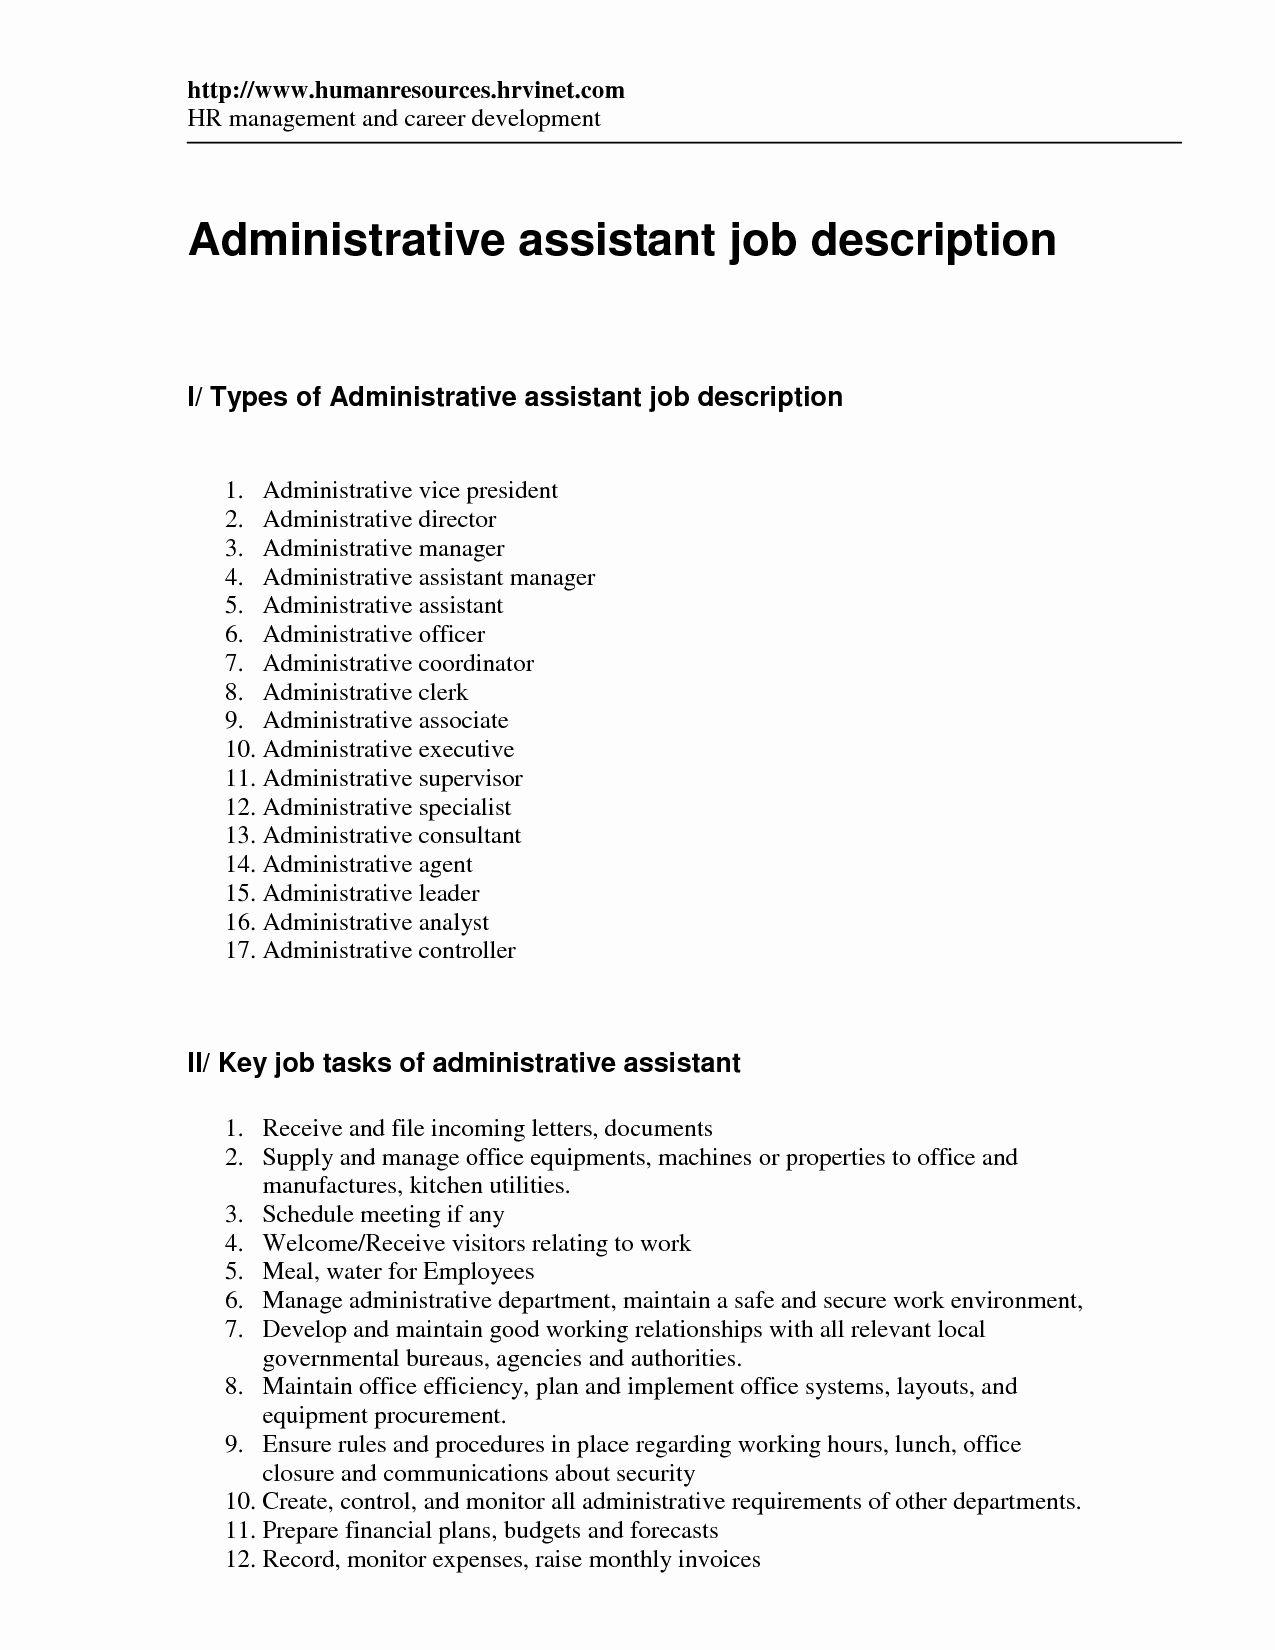 20 Office assistant Job Description Resume in 2020